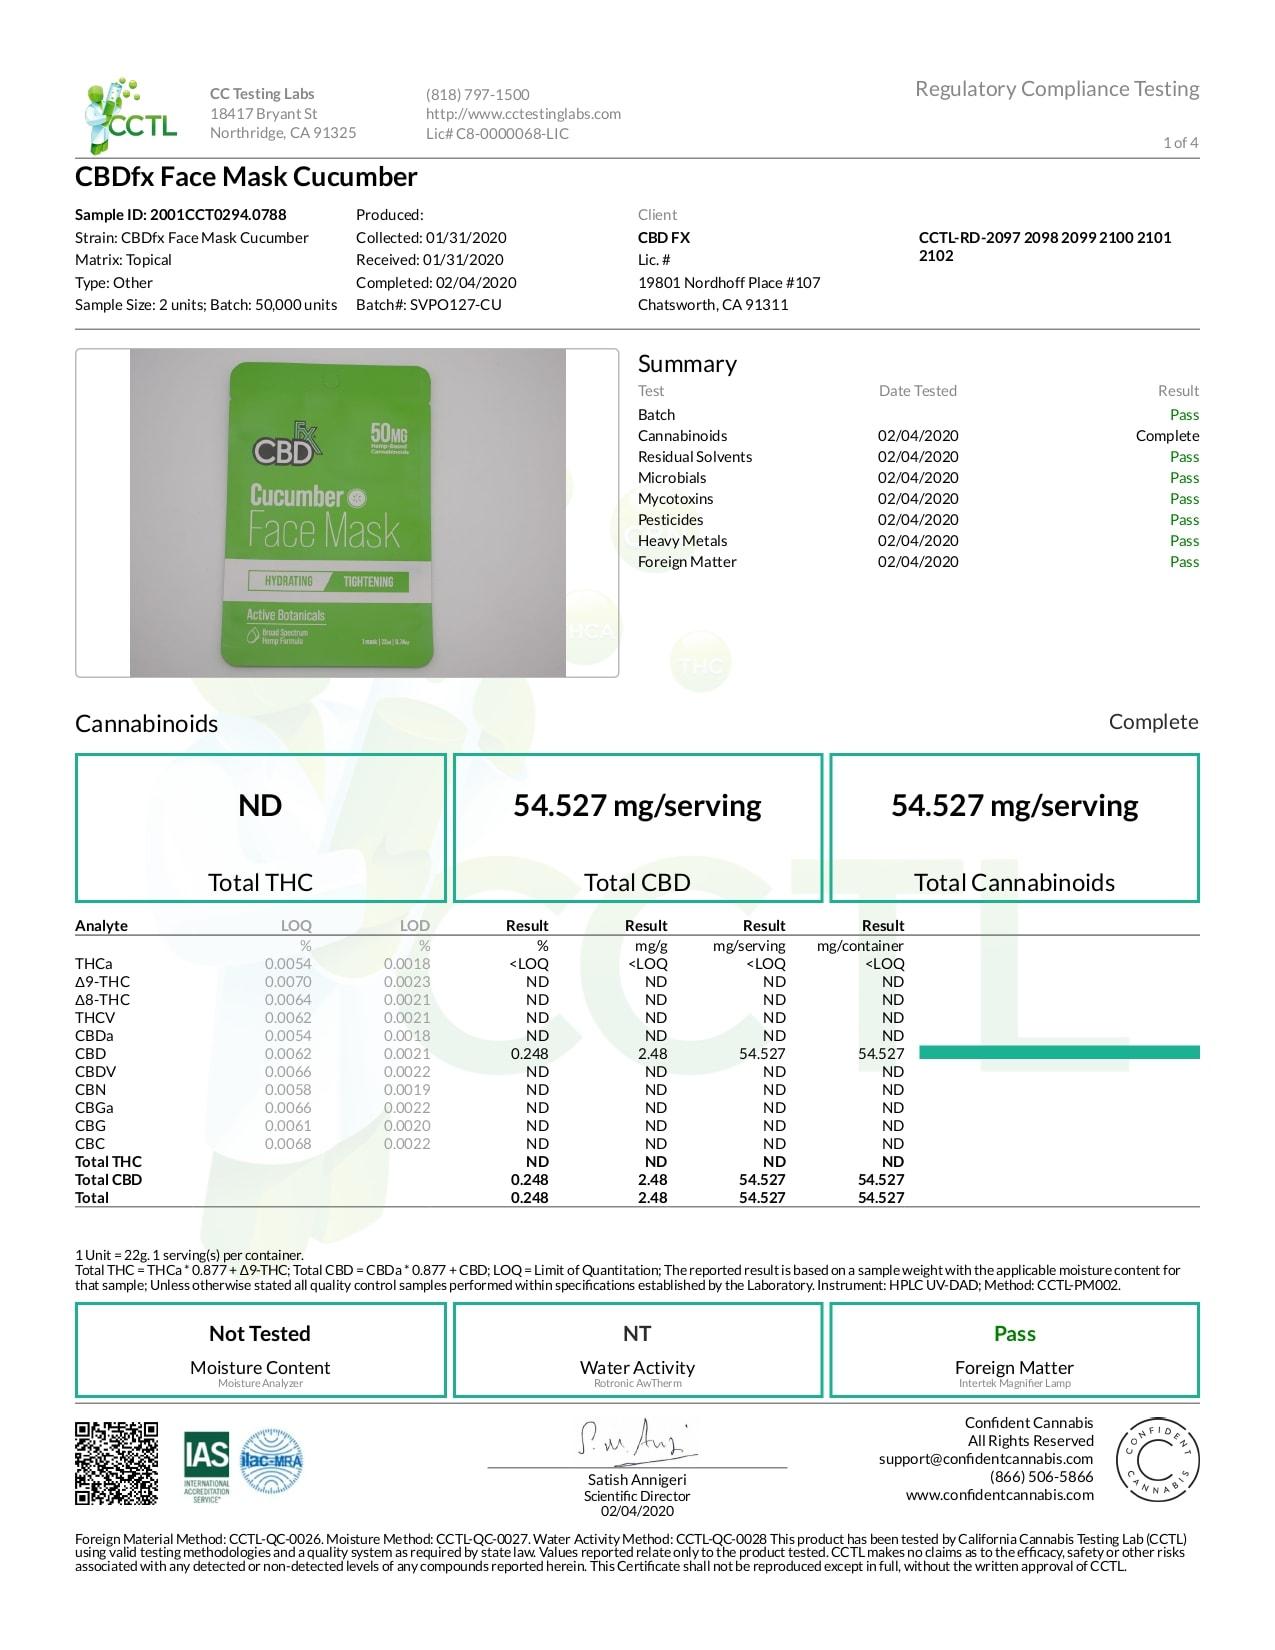 CBDfx CBD Cucumber Face Mask Lab Report Broad Spectrum 50mg